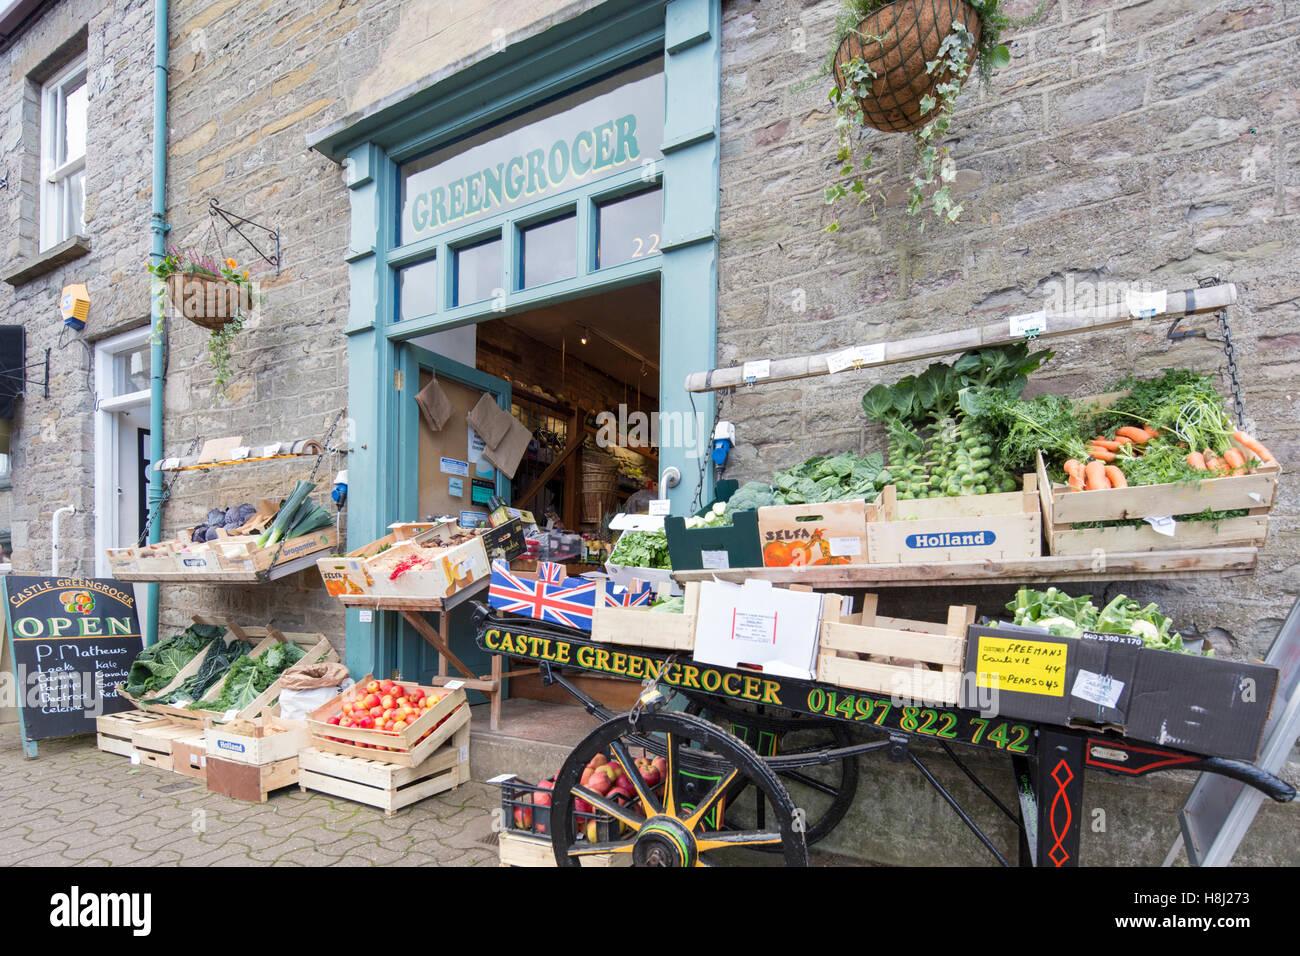 Greengrocer's display outside shop, England, UK - Stock Image